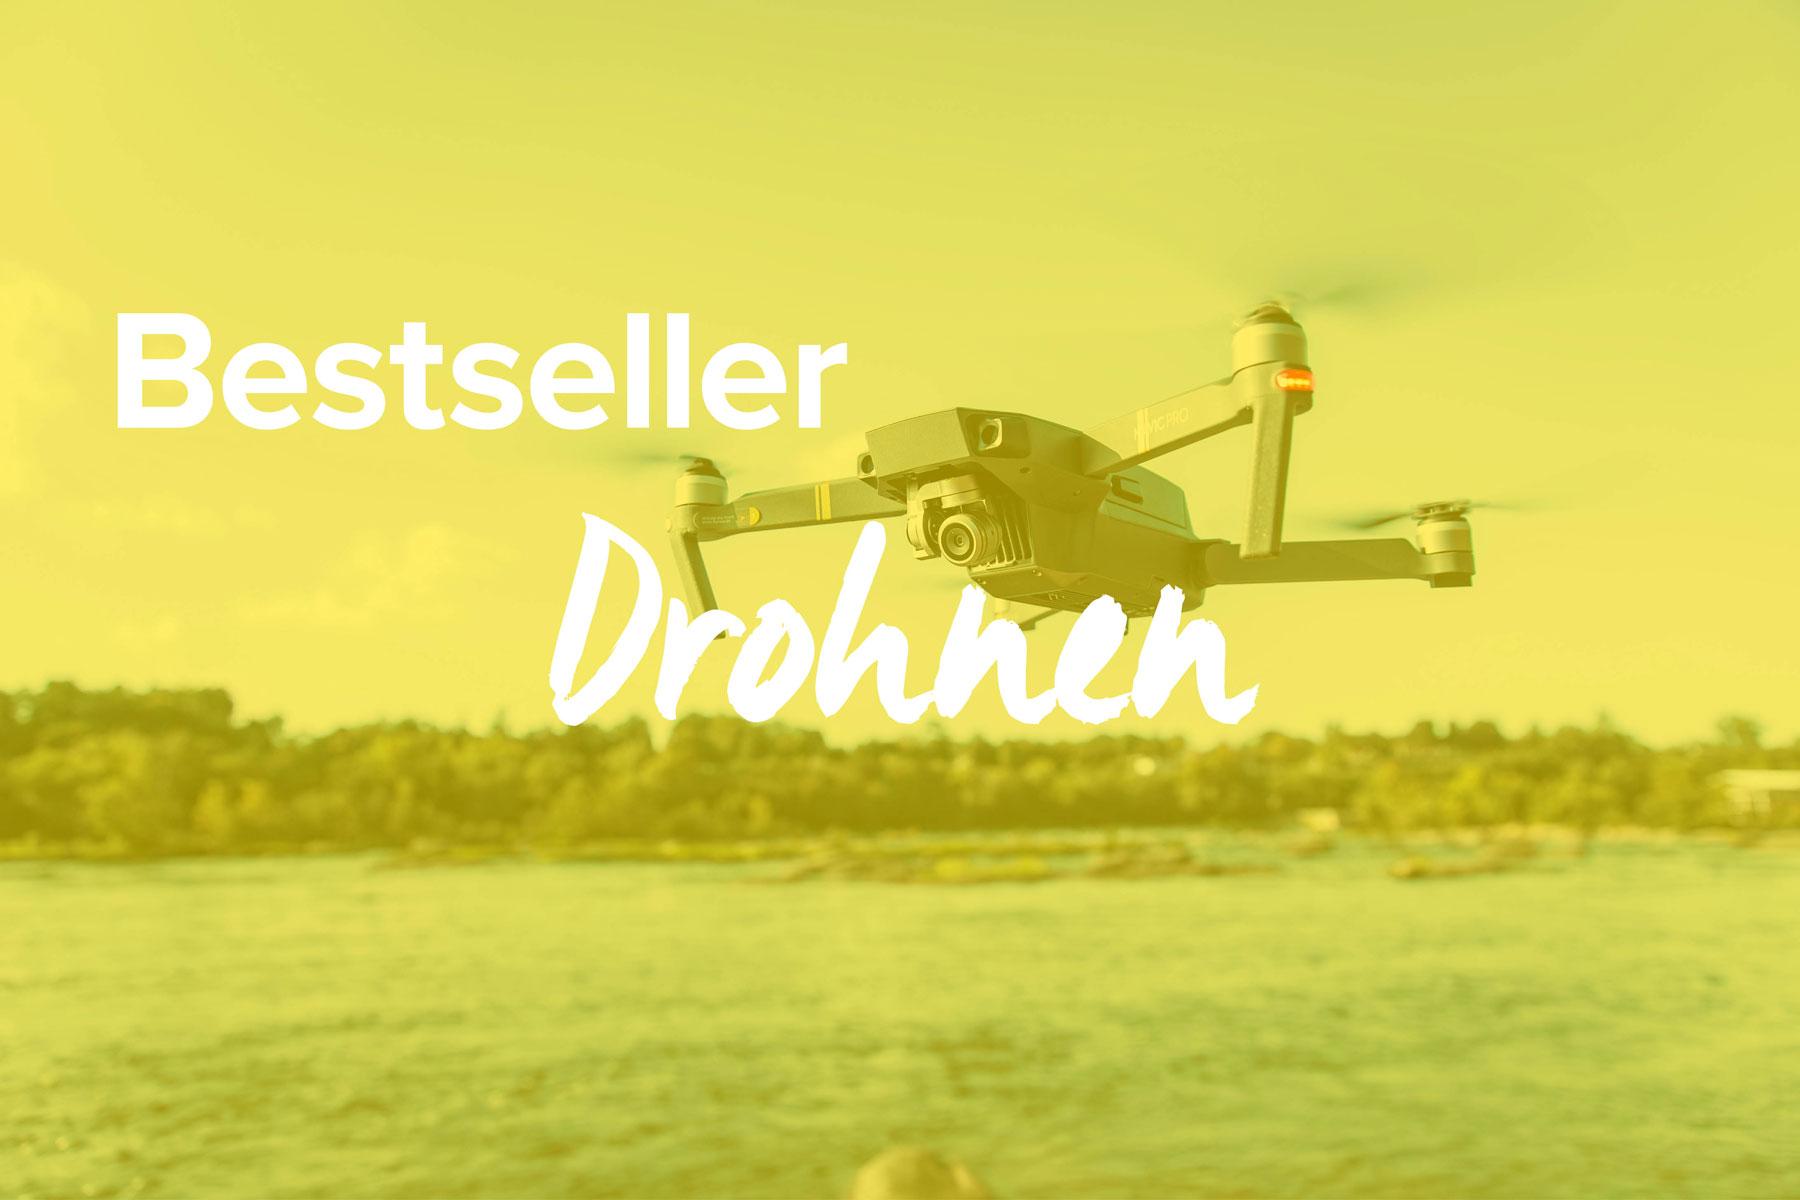 Bestseller Drohnen